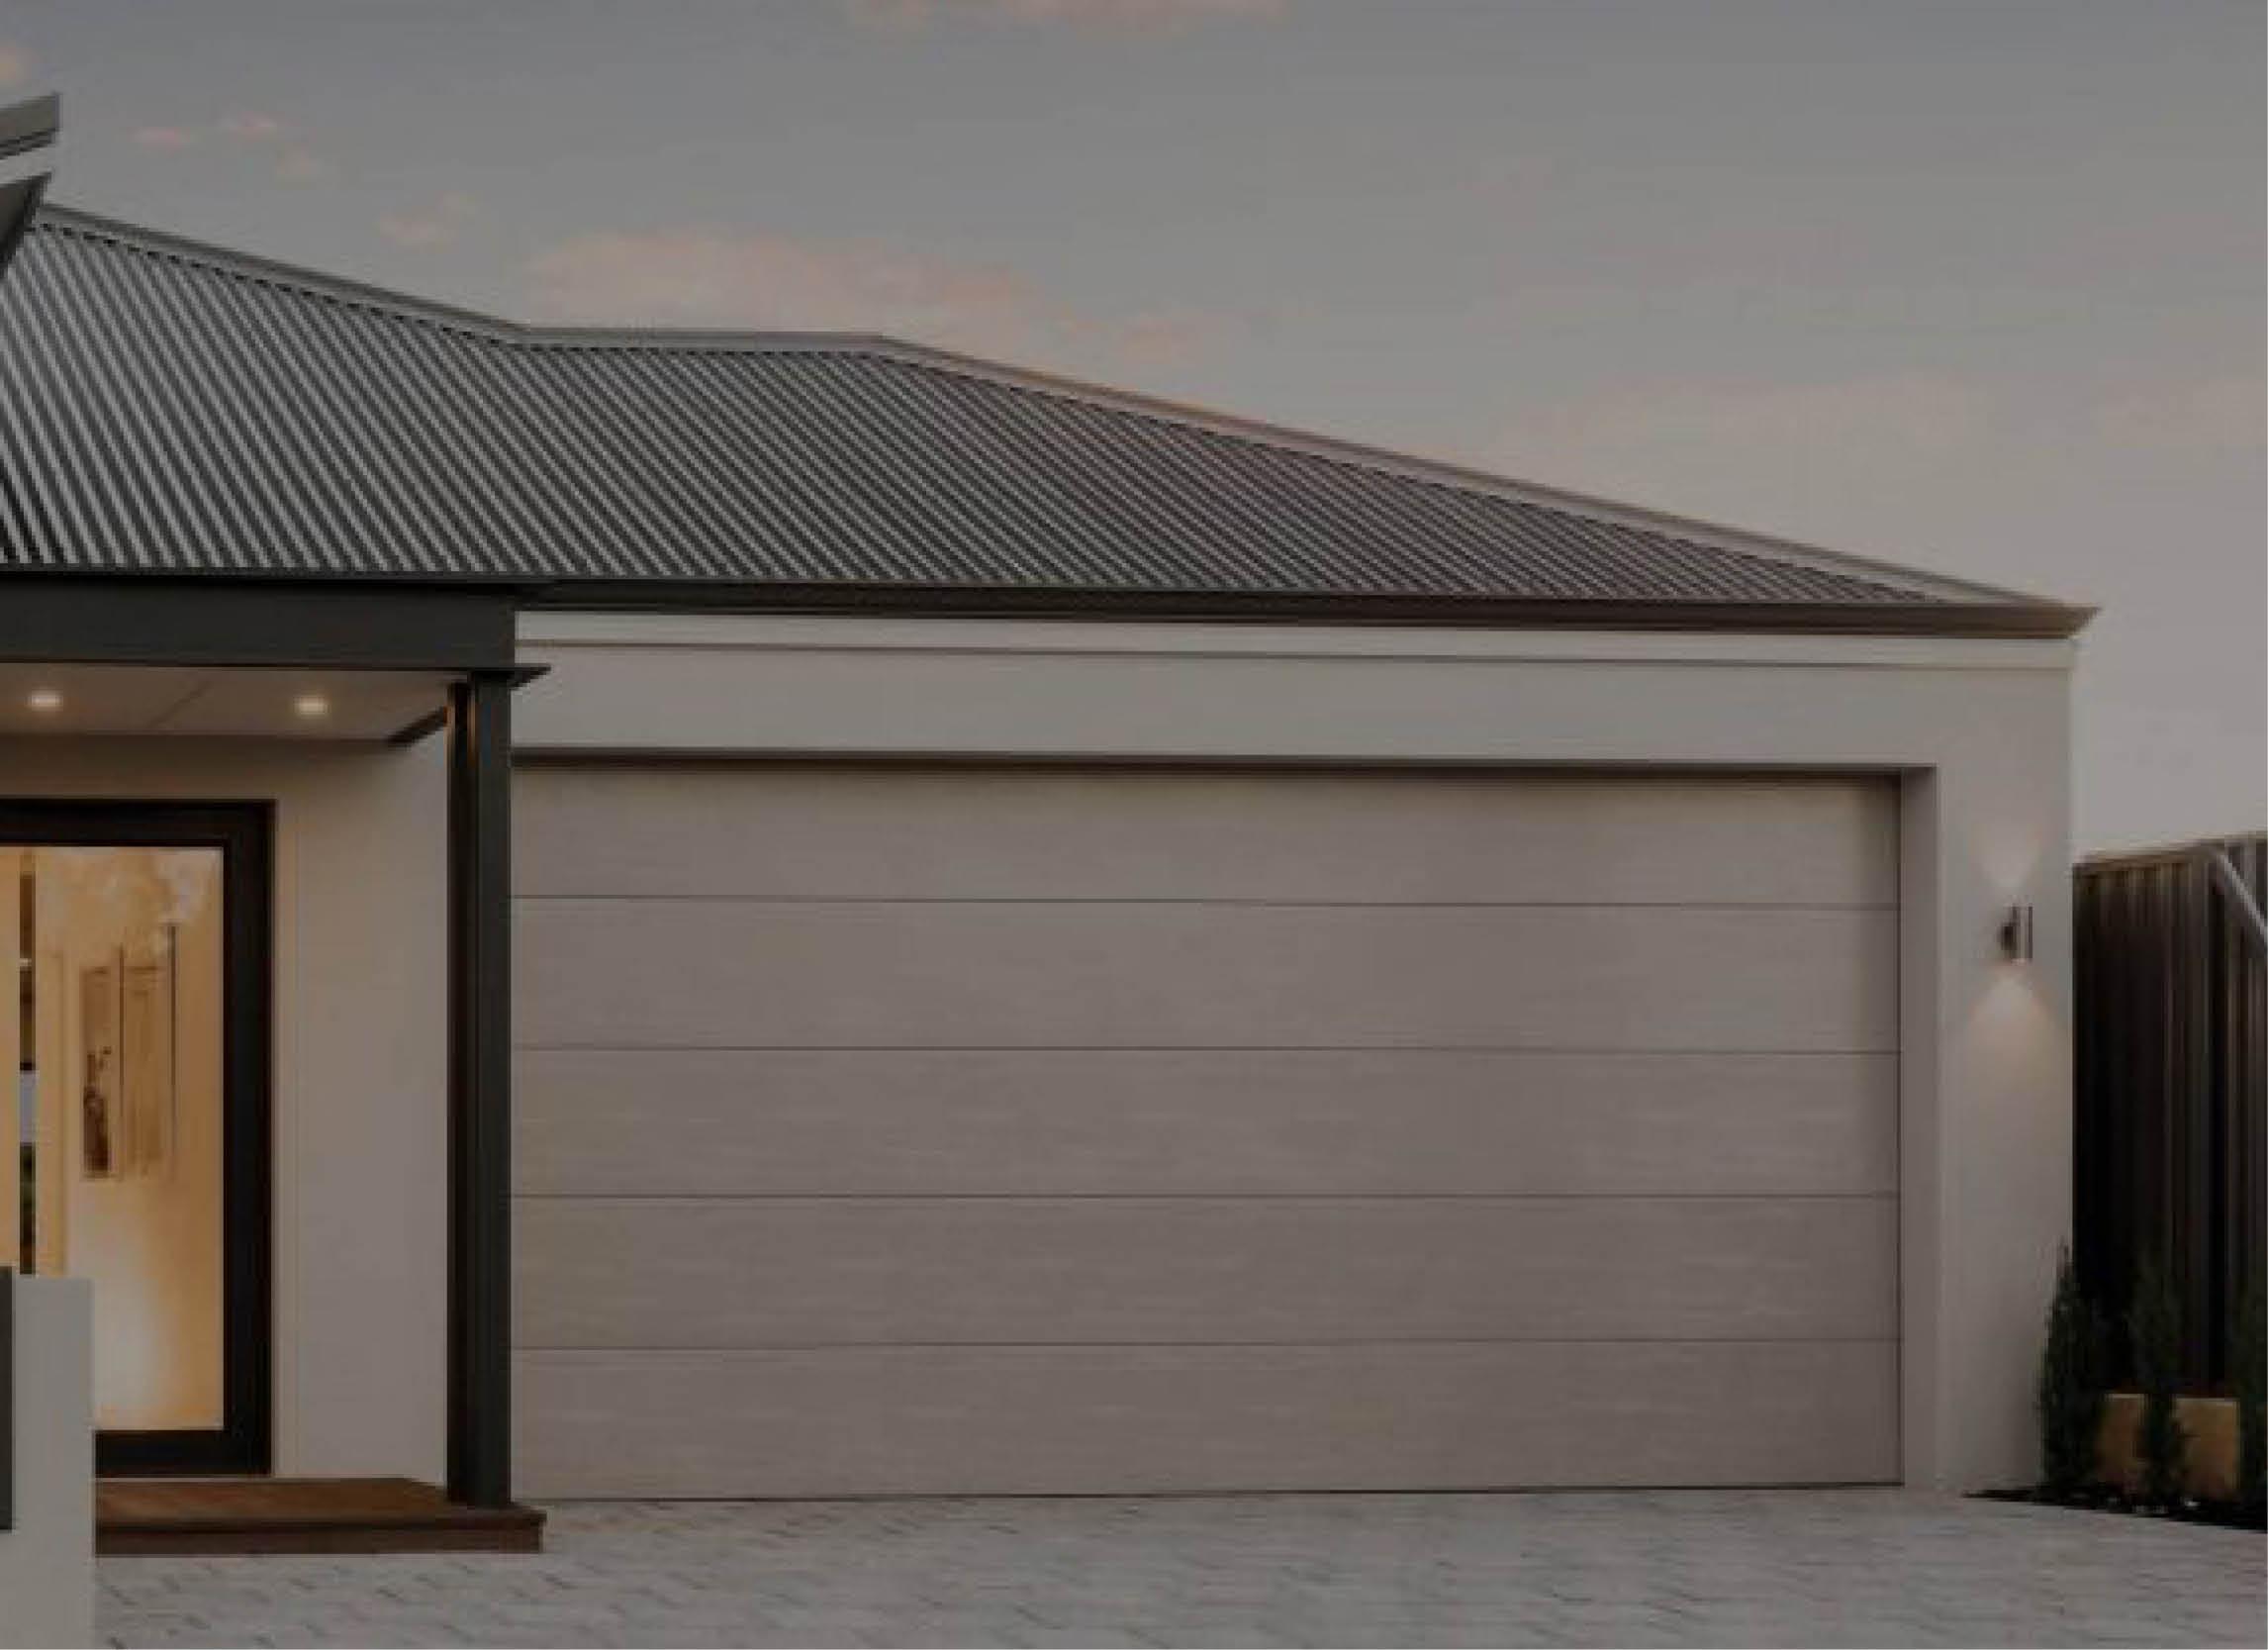 What to consider when buying a garage door